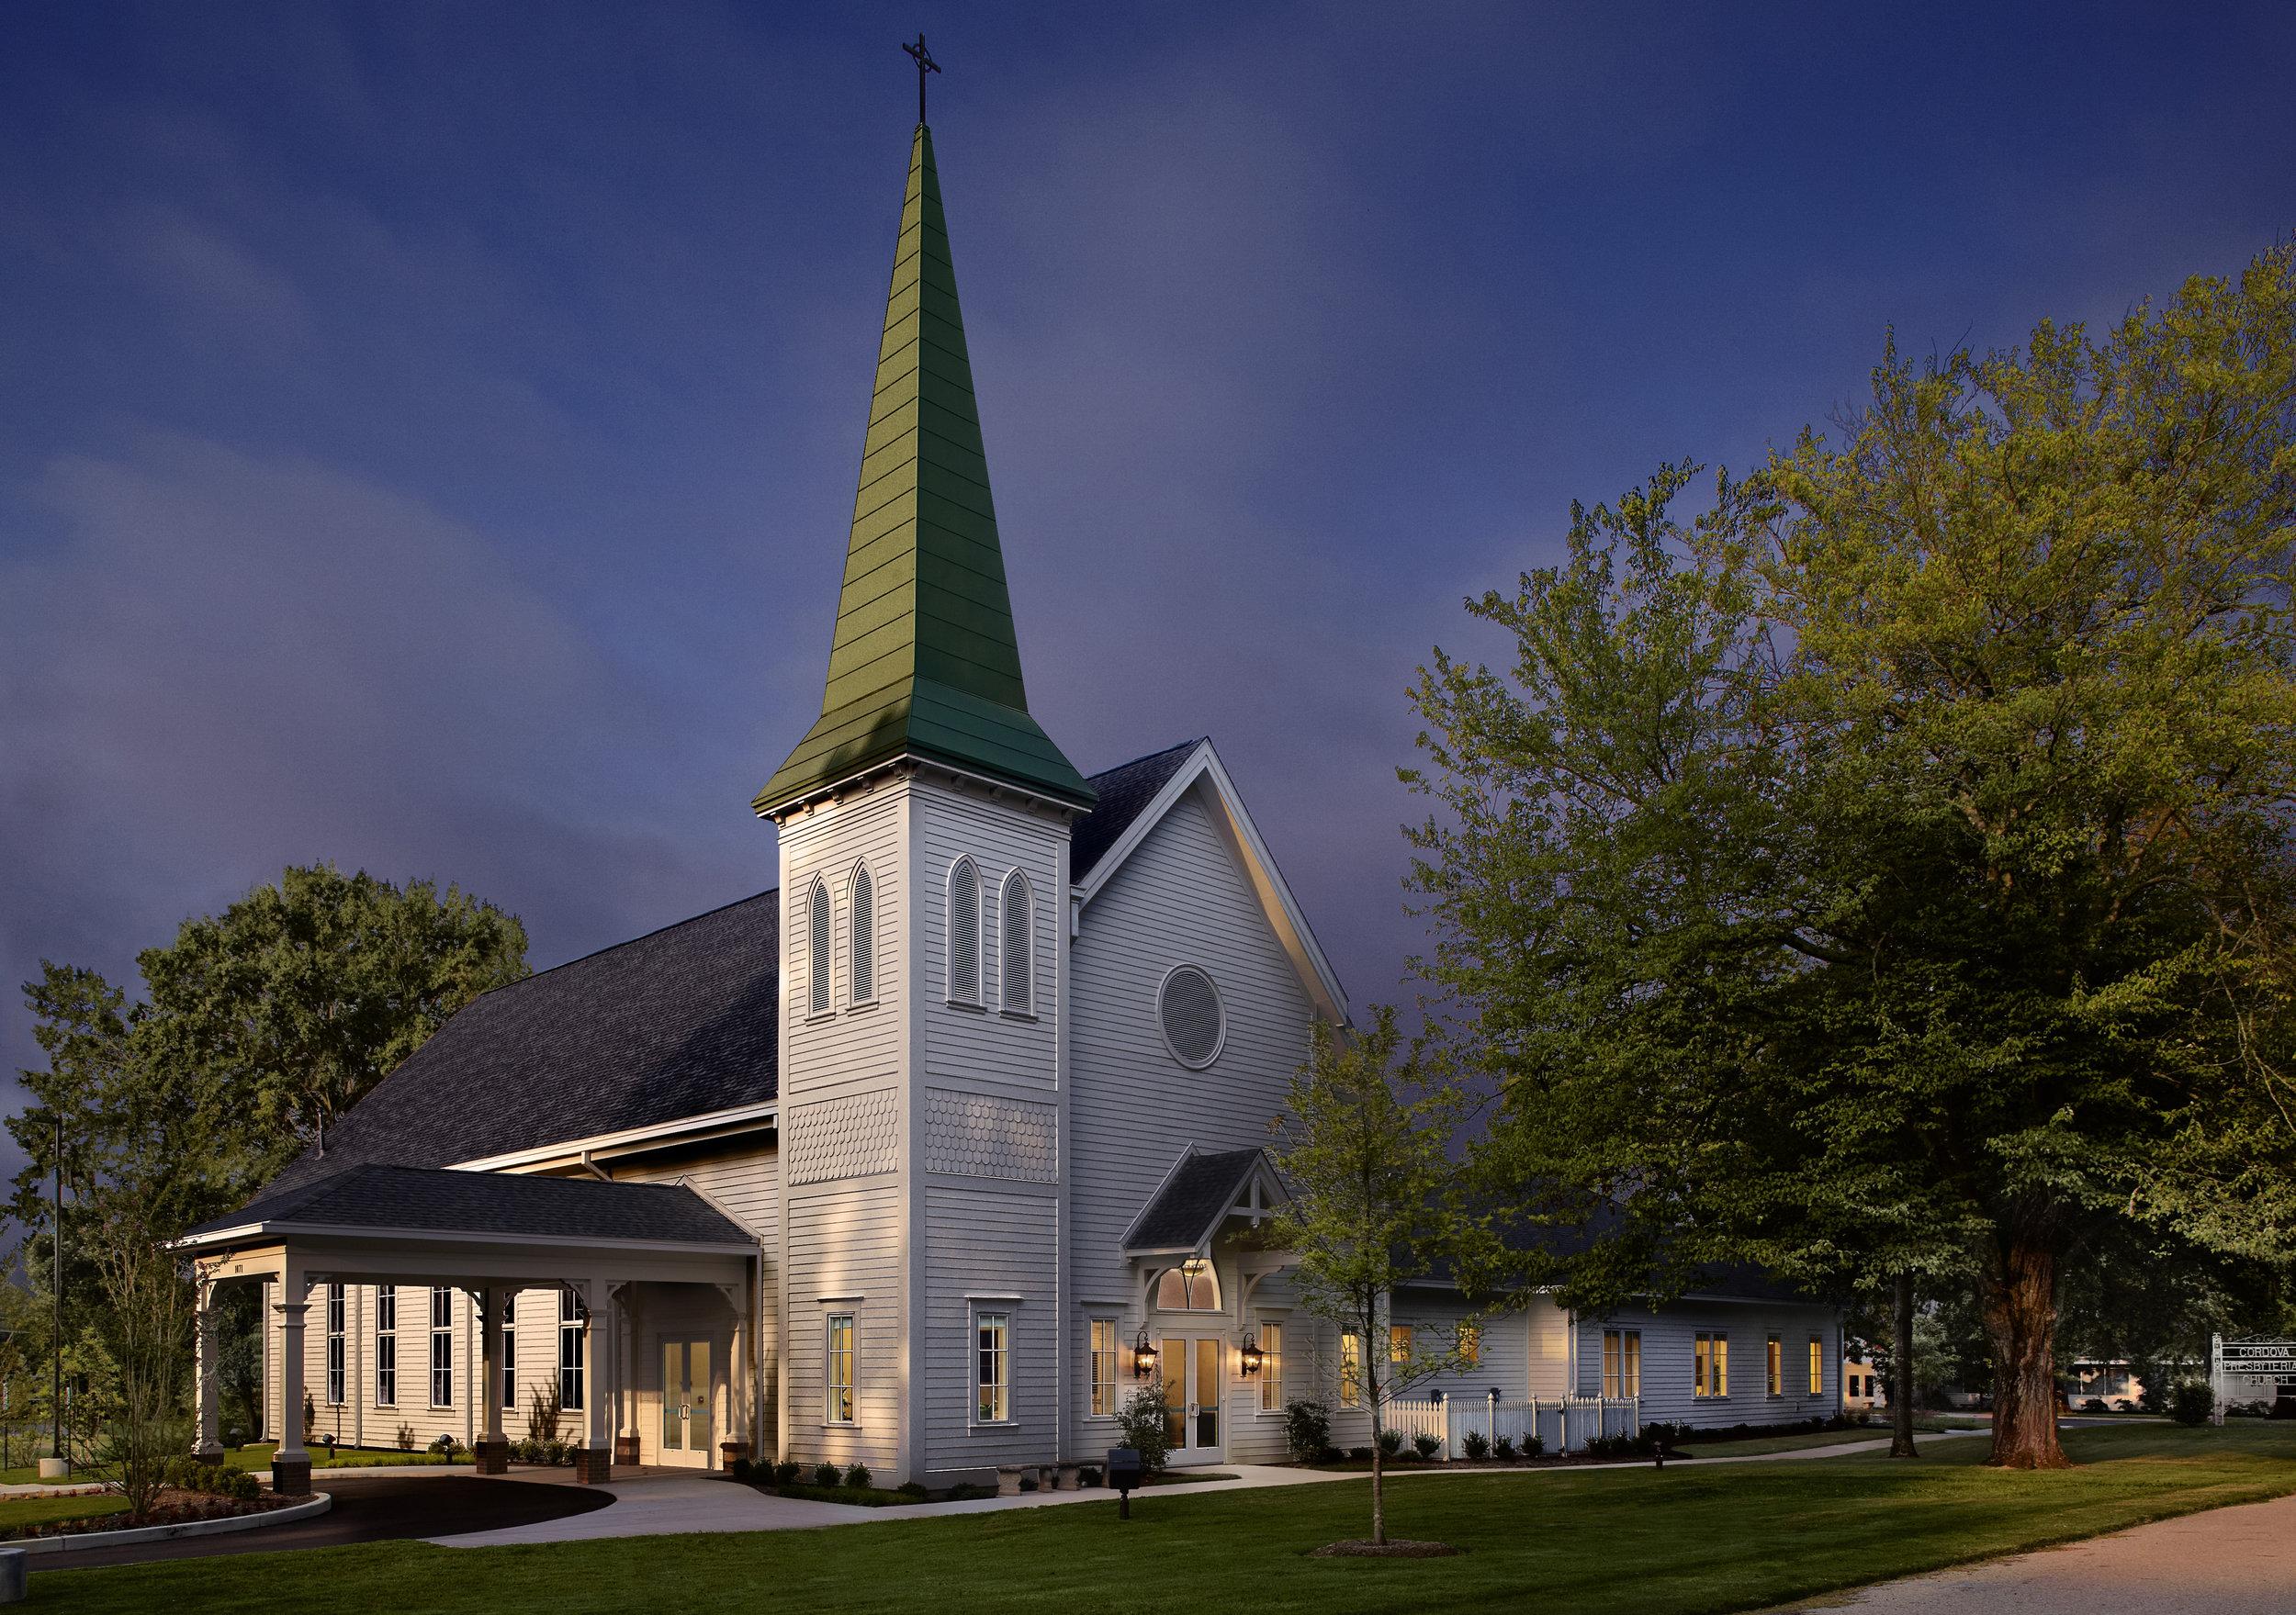 1 - Cordova Presbyterian Church - Sunrise Exterior - 9 in wide @ 600 dpi - credit Jeffrey Jacobs Photography.jpg